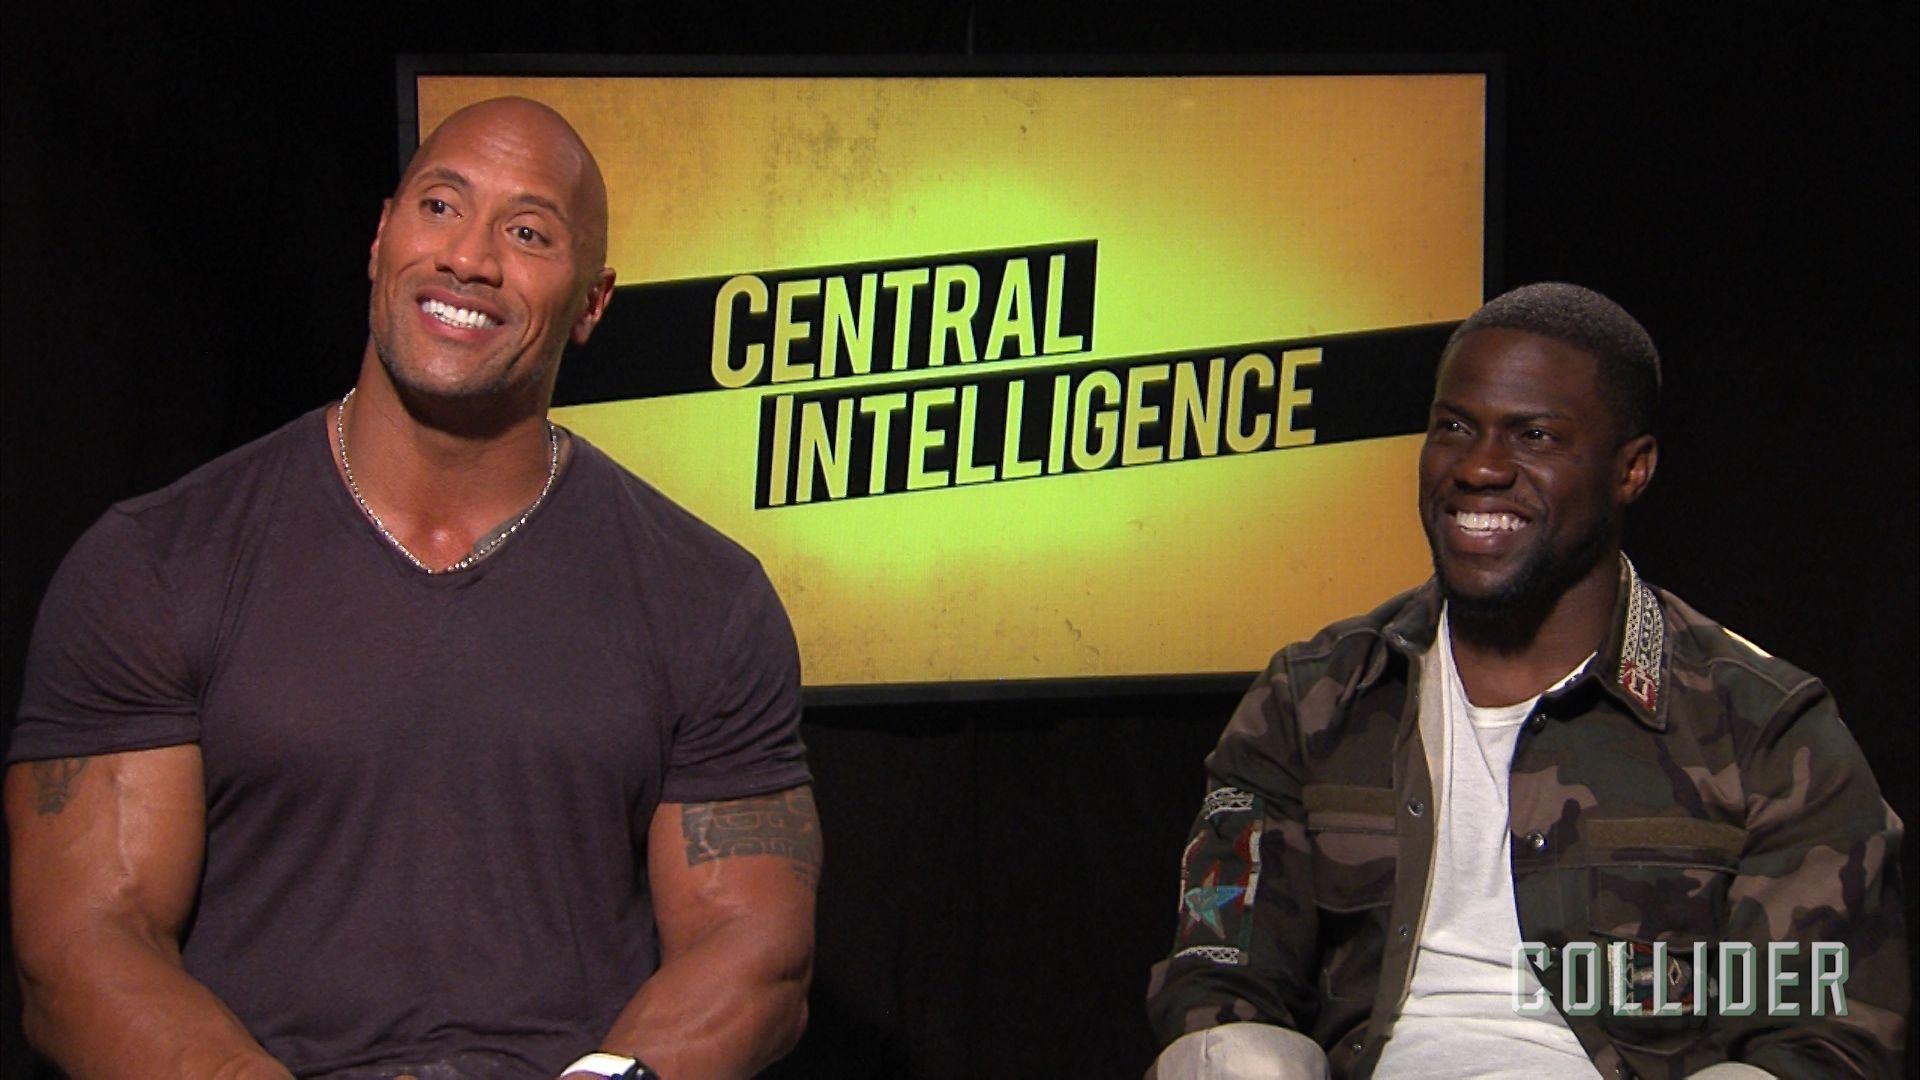 Dwayne Johnson Kevin Hart On Central Intelligence